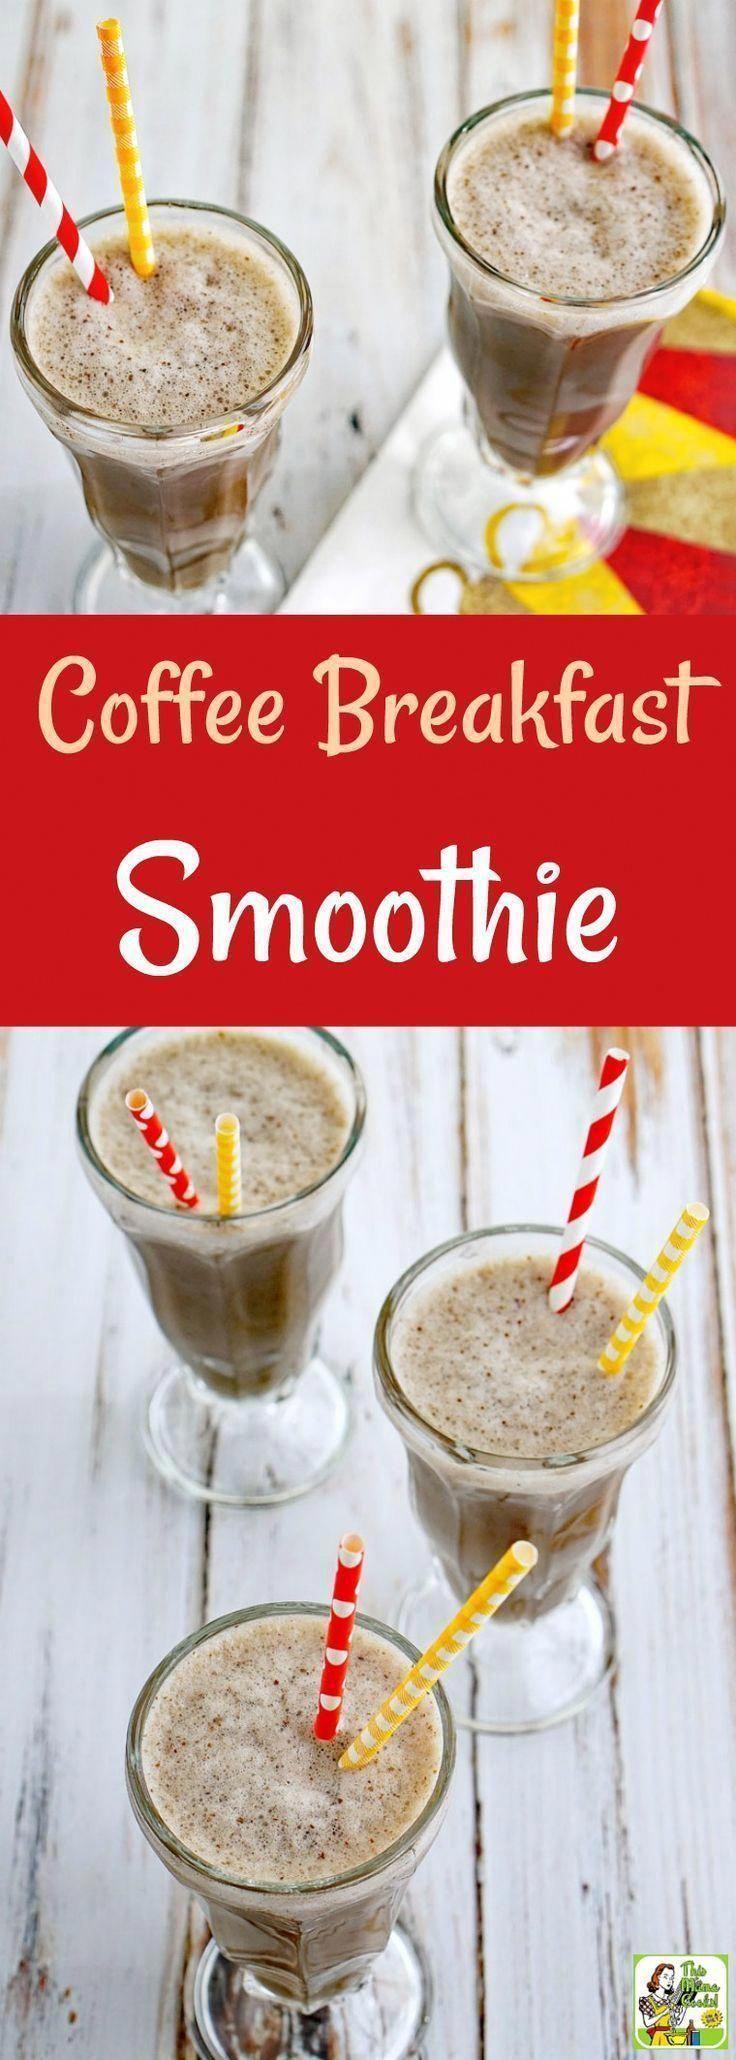 Coffee Day Powder Near Me #healthybreakfastnearme